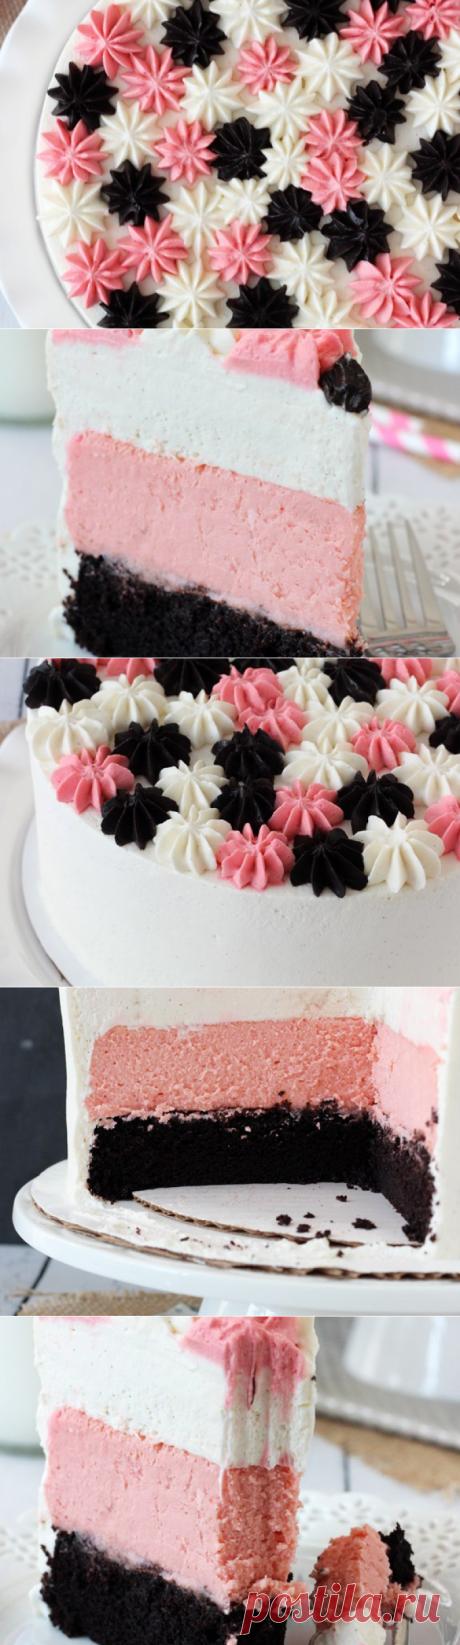 Cake Neapolitan millionaire | Sweet Twittes